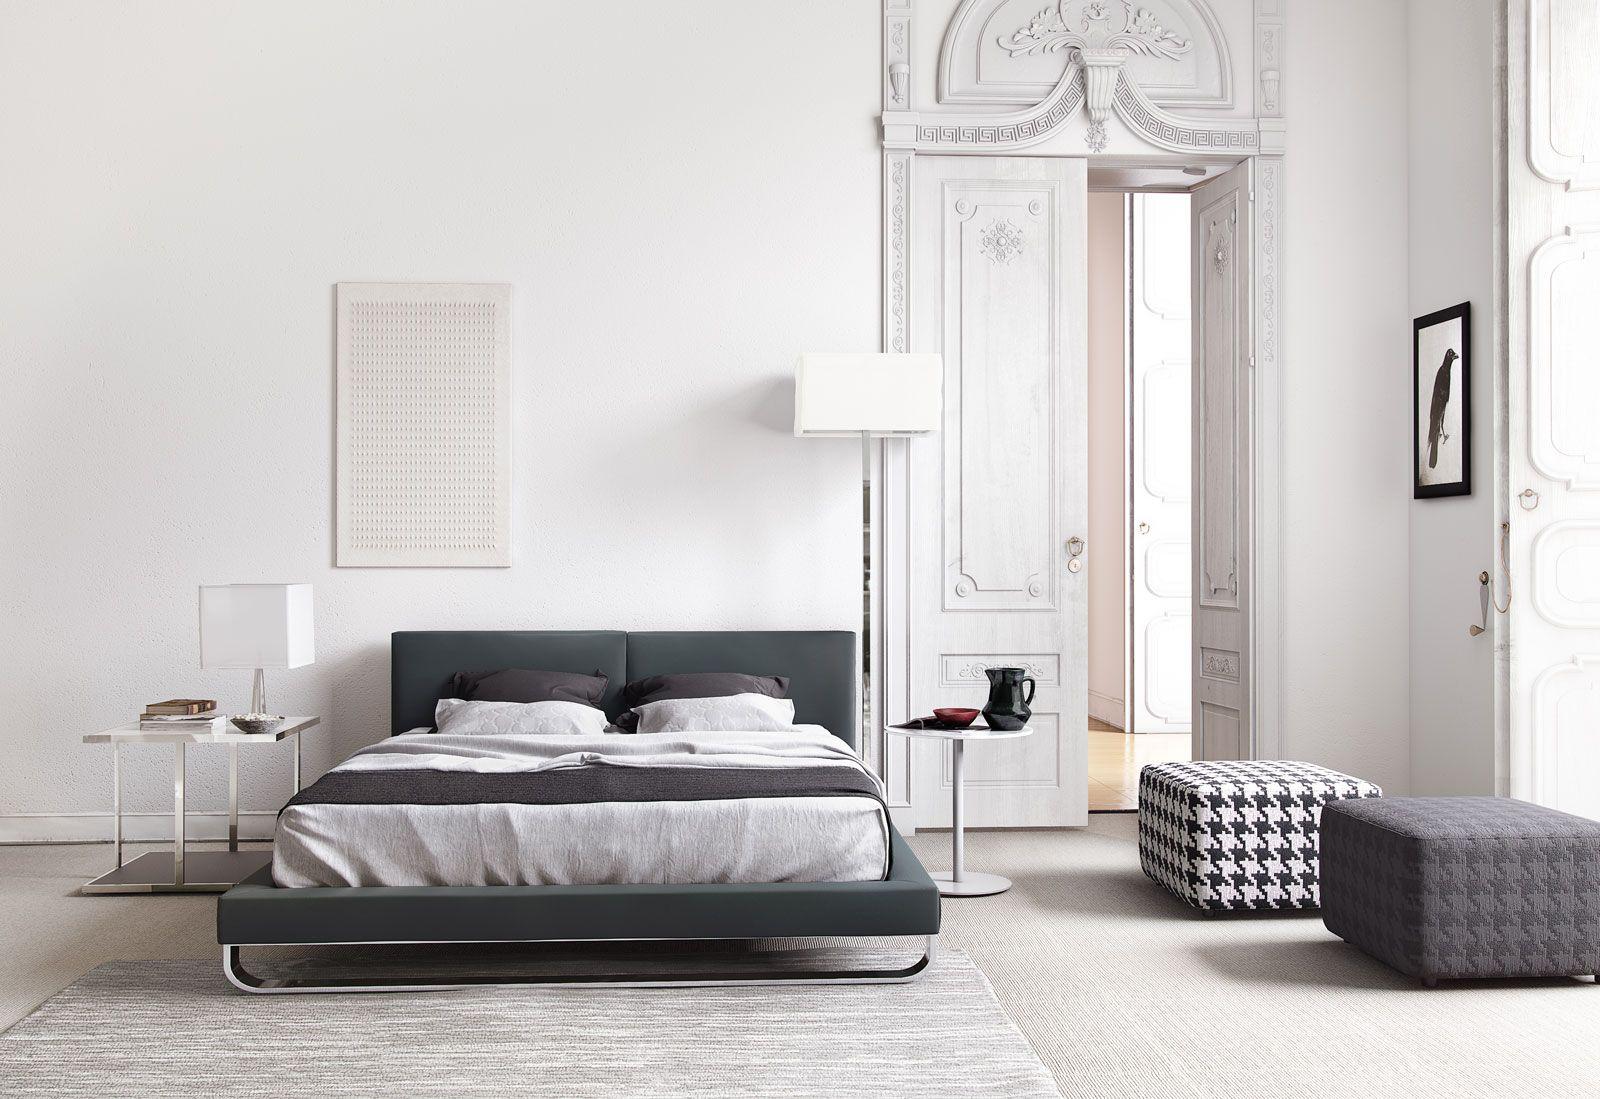 Best Modloft Chelsea Queen Bed Limited Md331 Q Blul Official 400 x 300